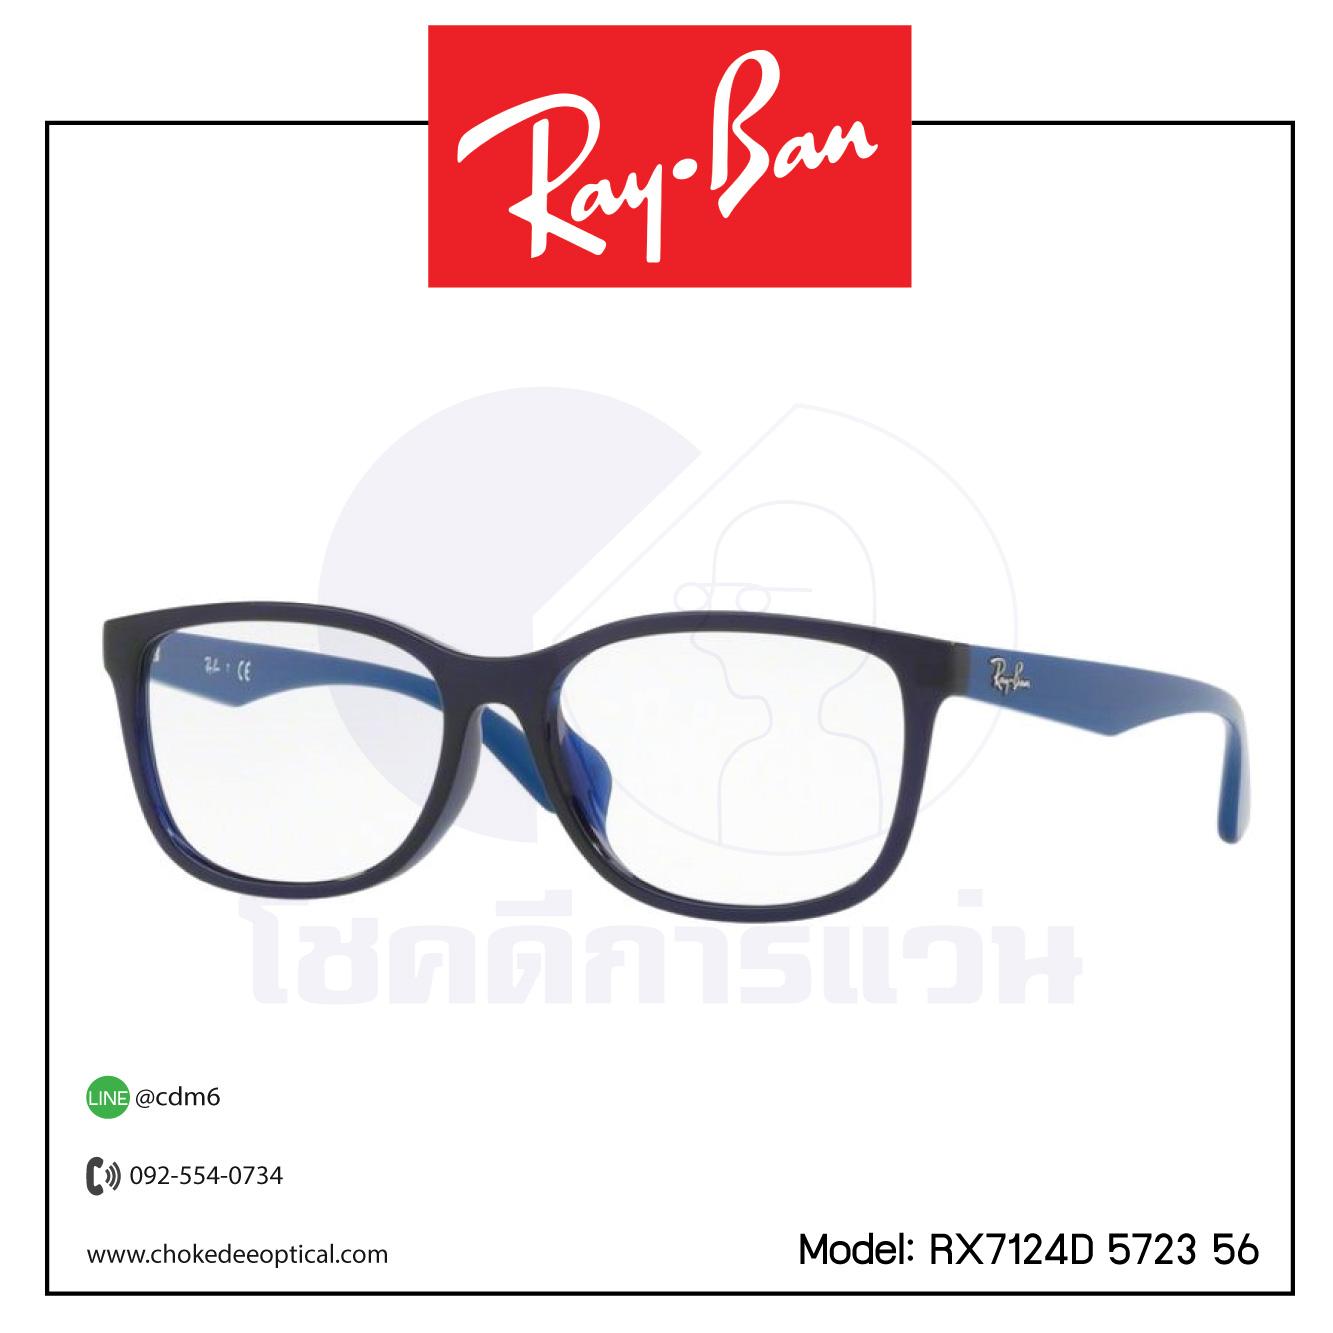 Rayban RX7124D 5723 56